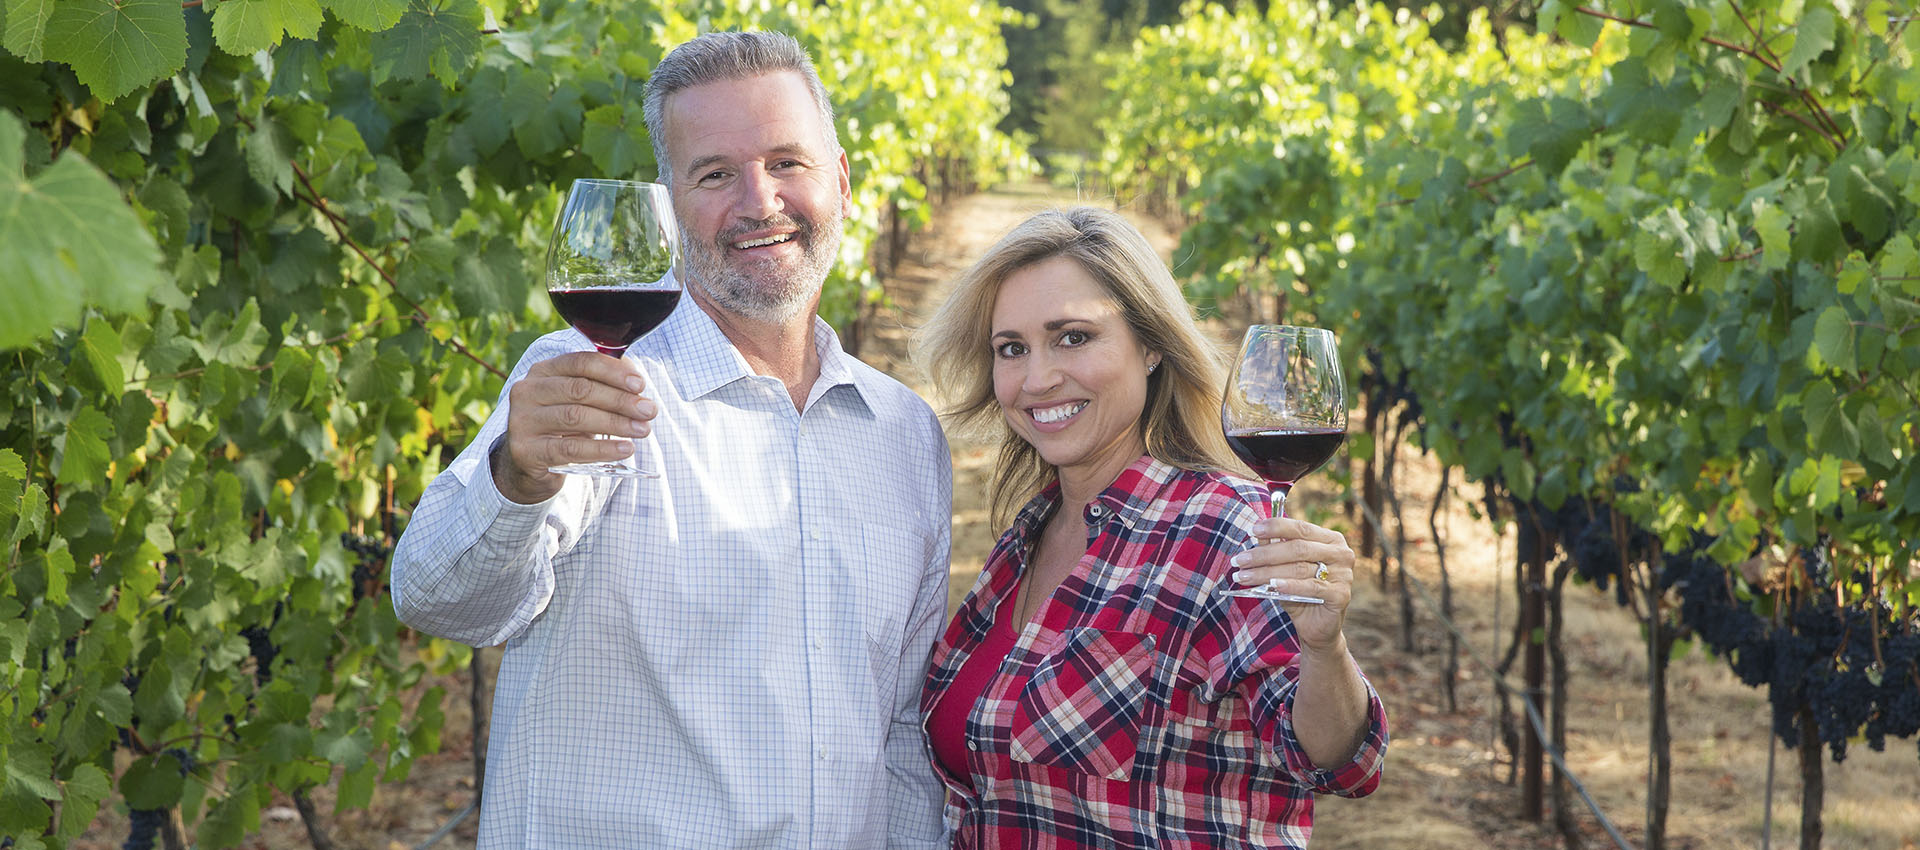 Descubre la cultura del vino